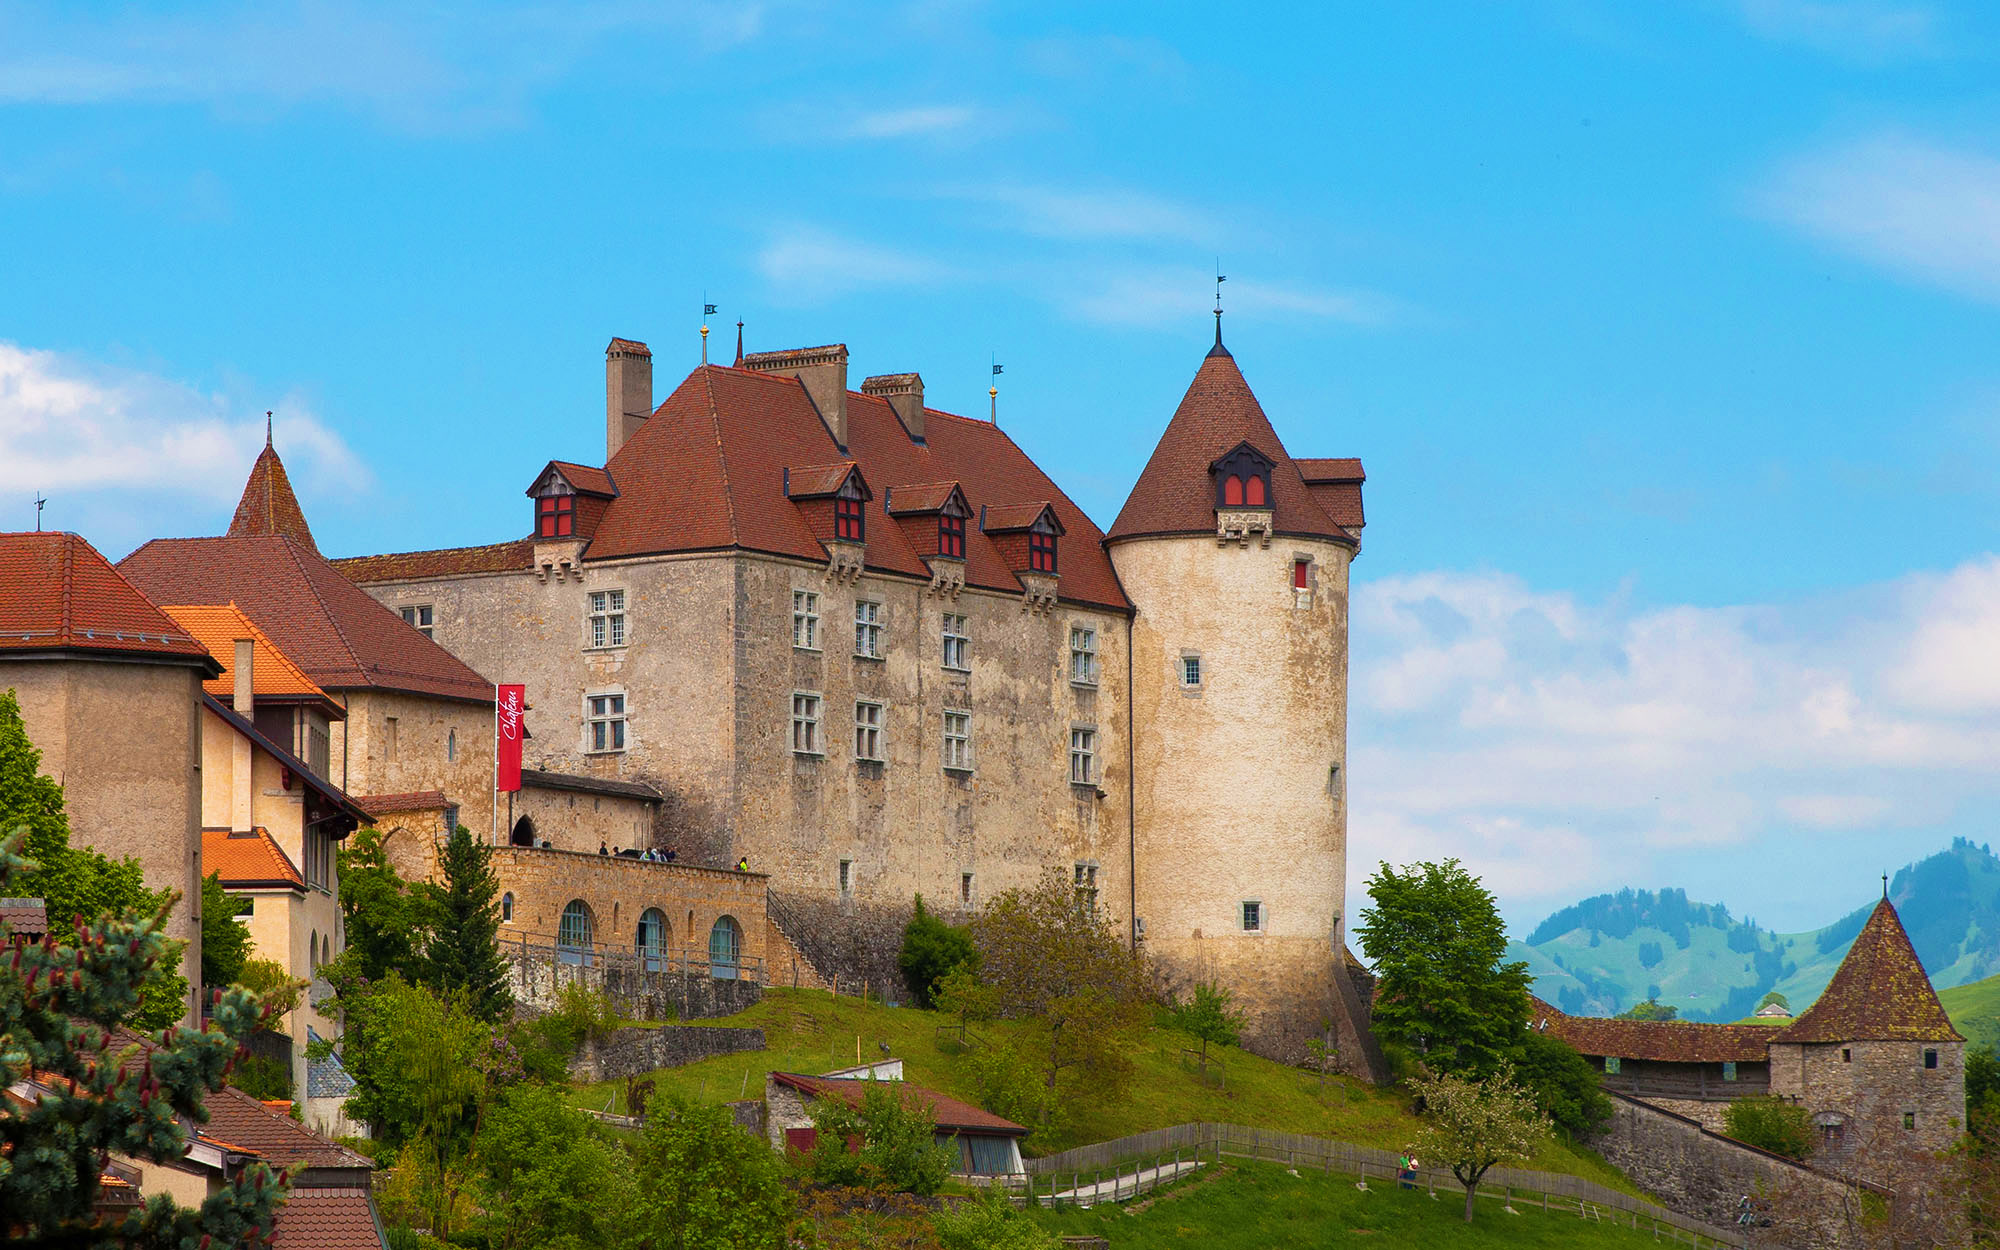 kt_2020_350_Keytours_excursions_Swisstours_gruyères_village9_2048_10